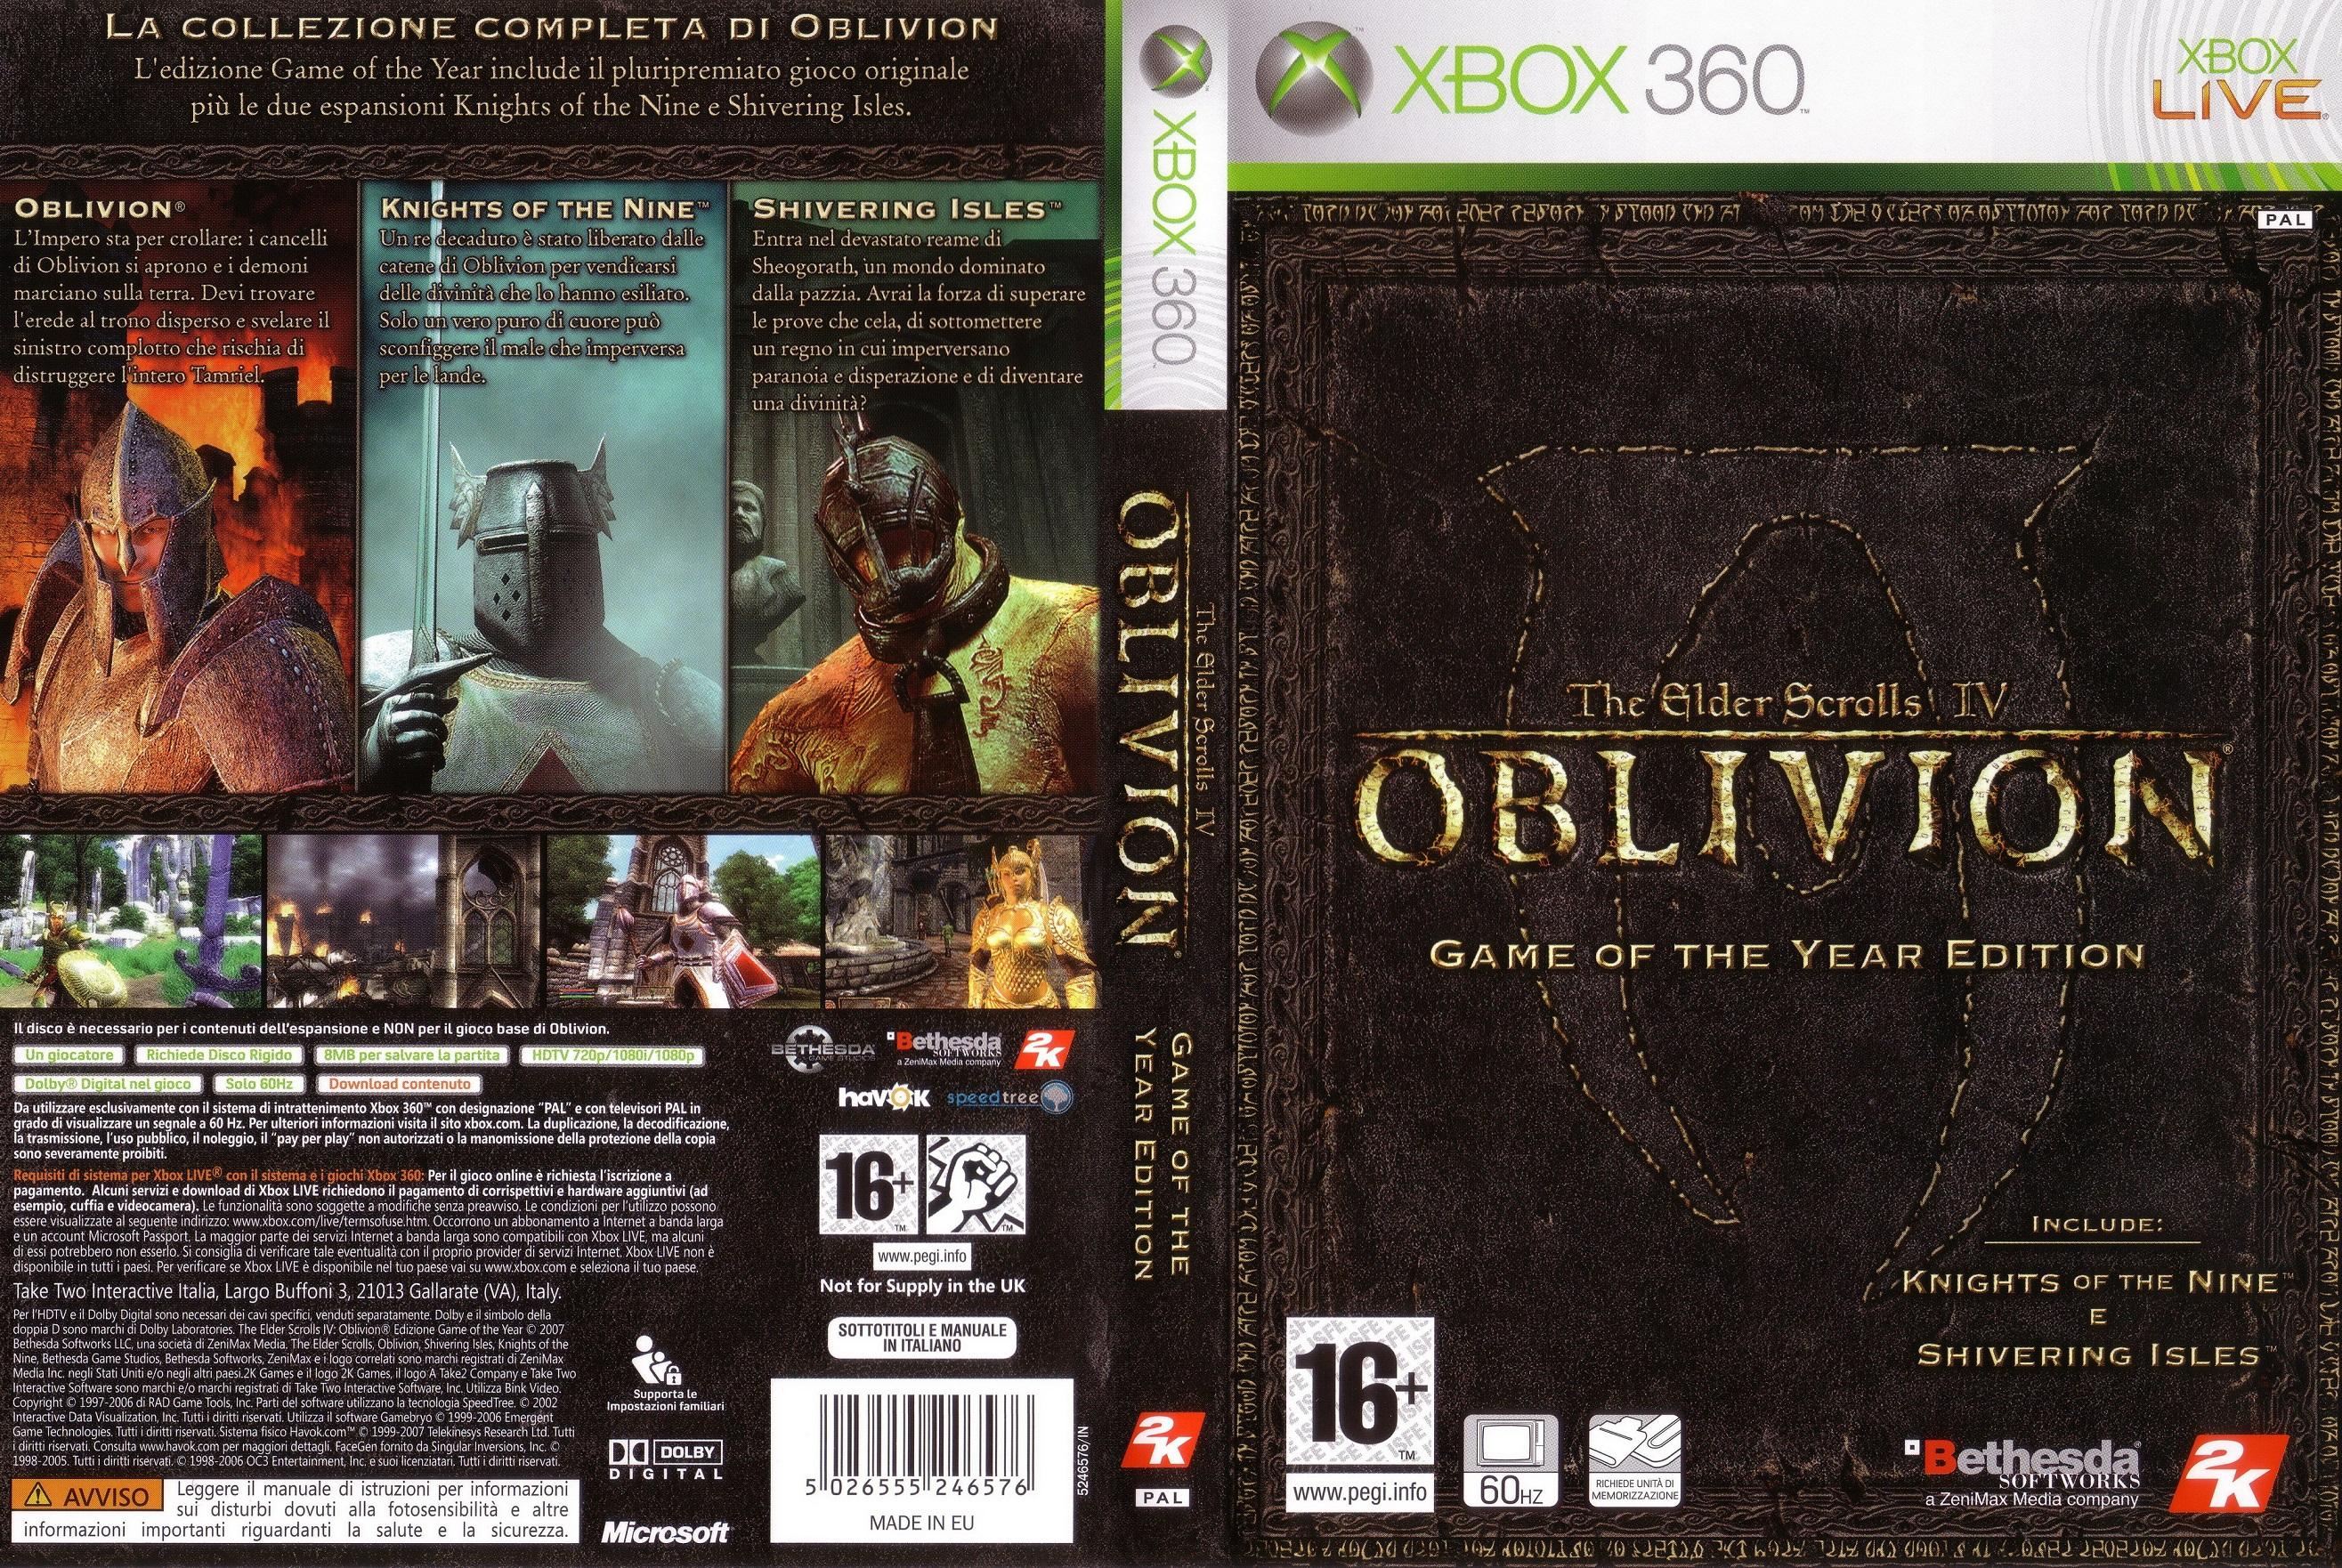 The elder scrolls iv: oblivion (collector's edition) xbox 360.